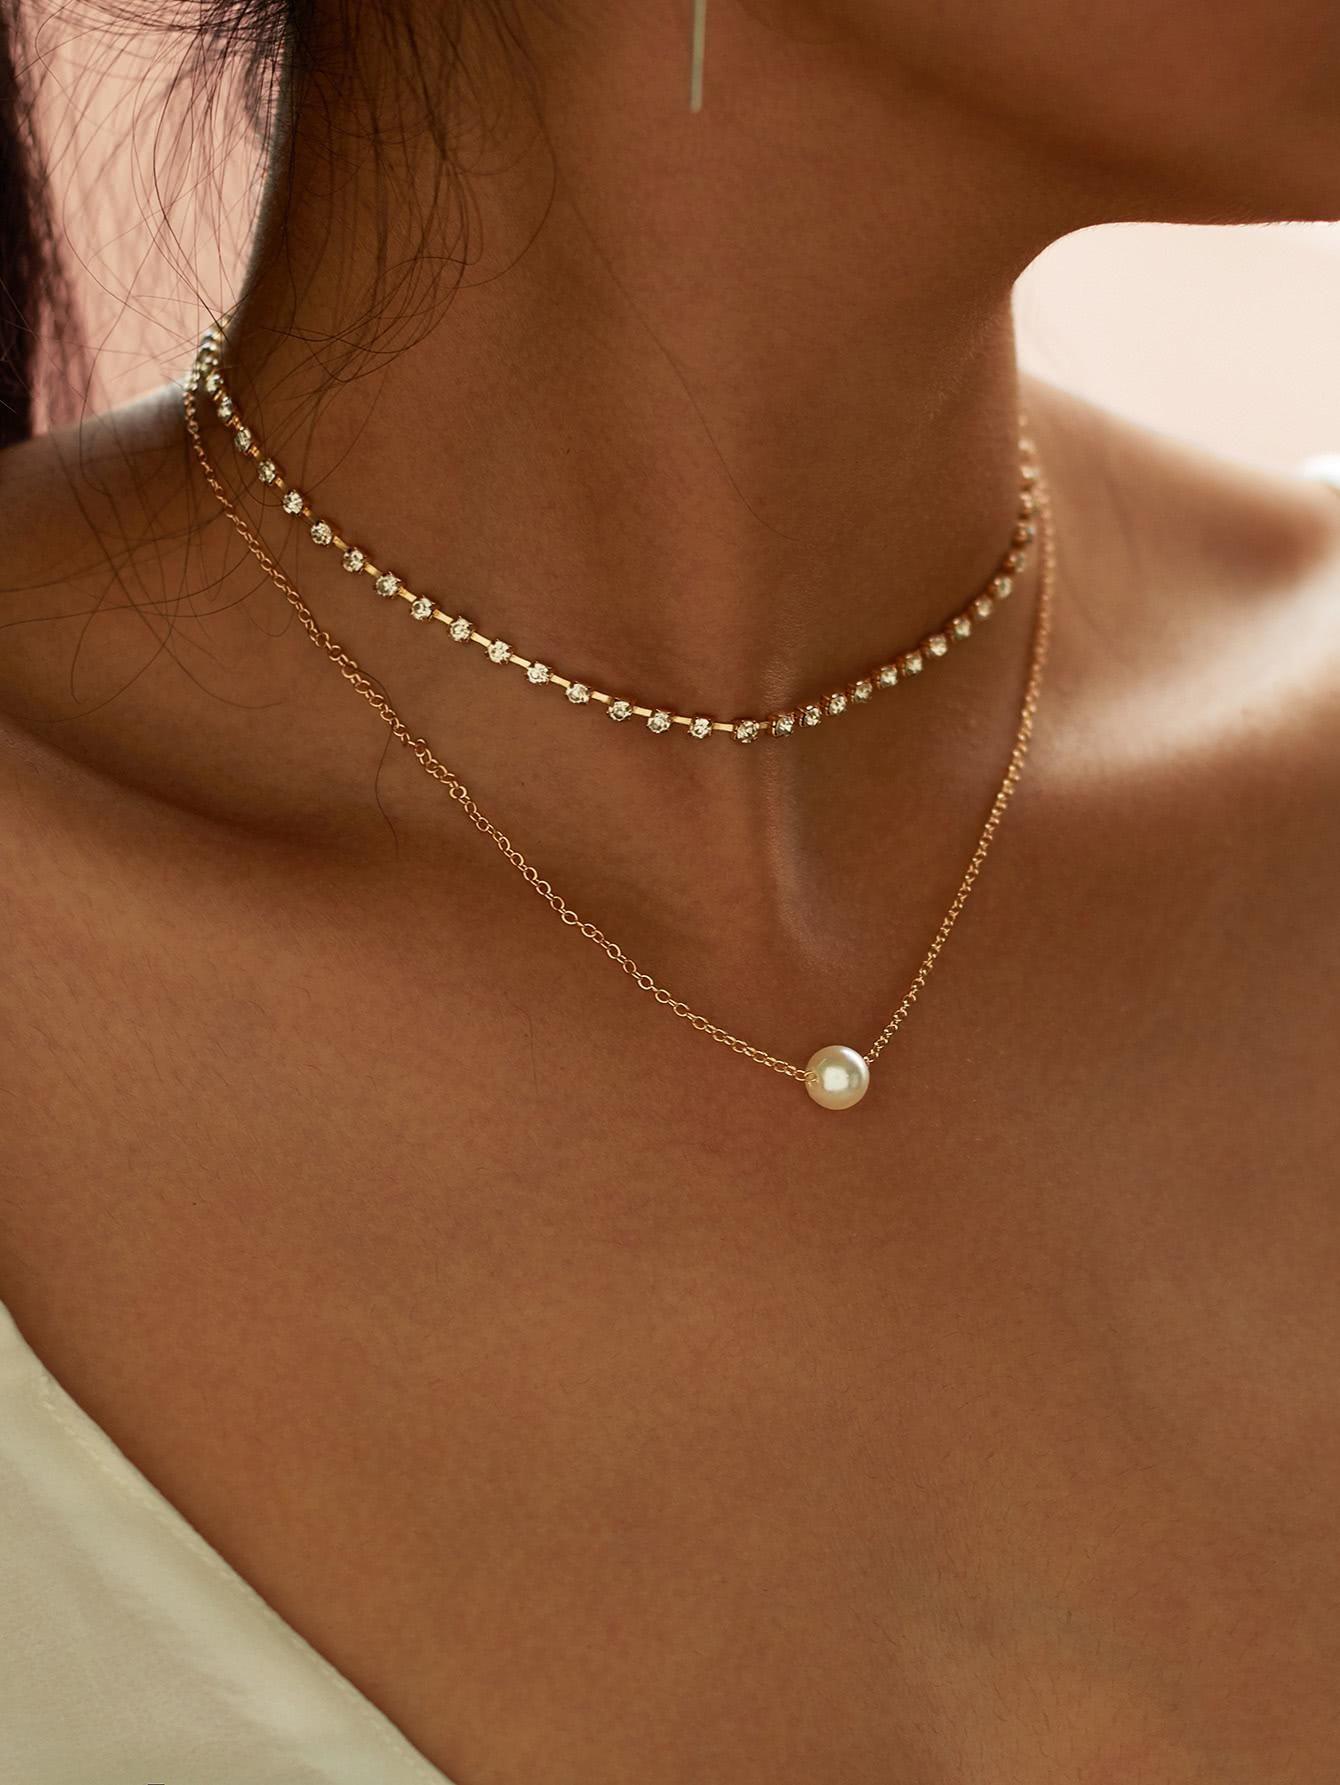 e0c20f7198 SheIn - SheIn Faux Pearl Pendant Rhinestone Choker Necklace 2pcs -  AdoreWe.com